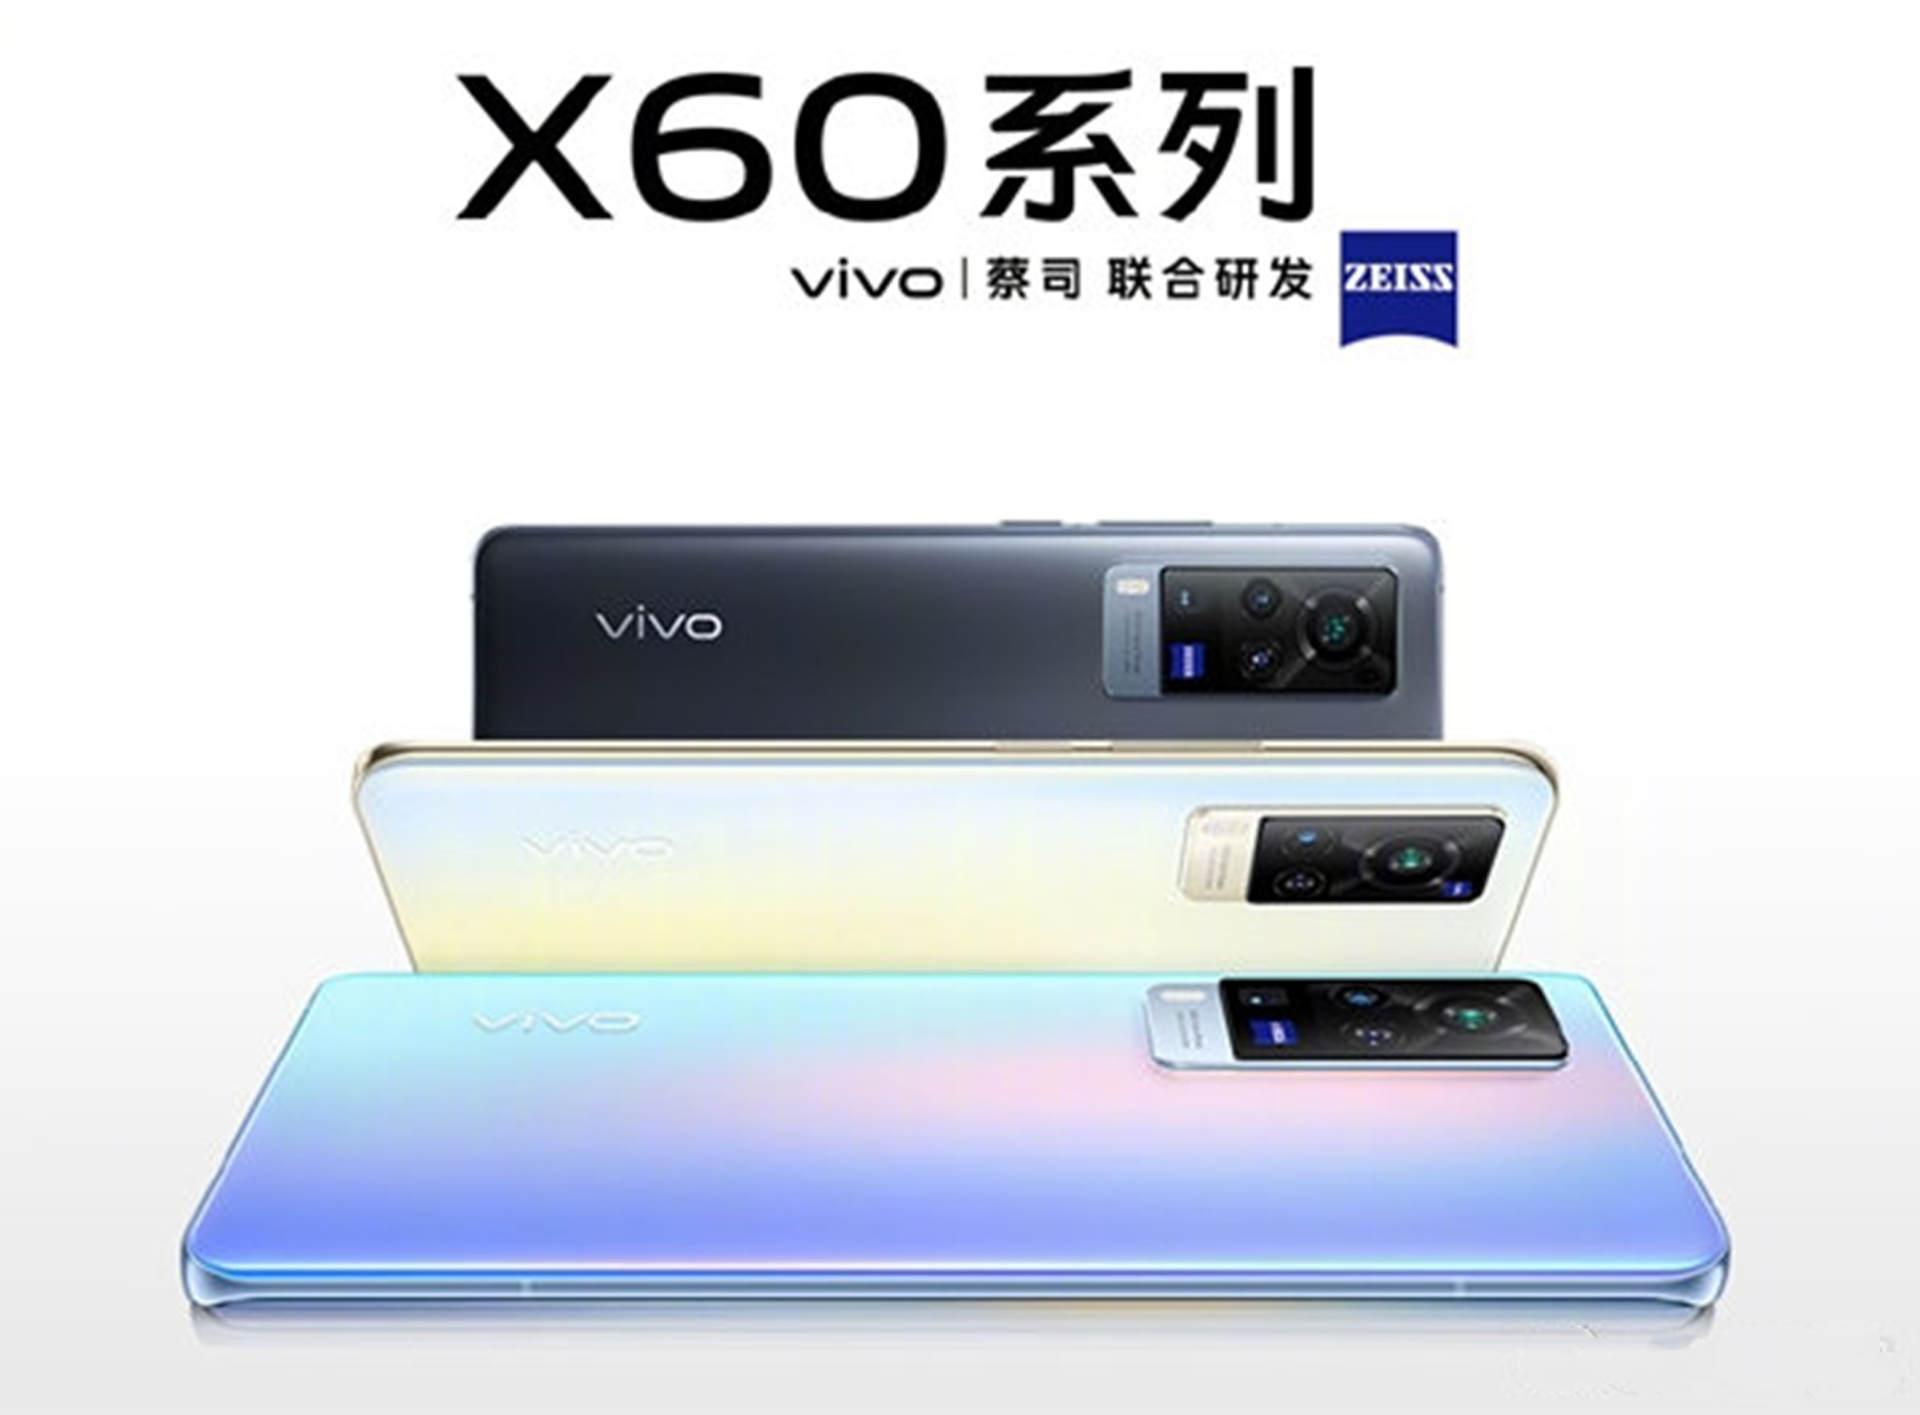 Vivo X60 Pro已准备就绪,21日将发布官方公告